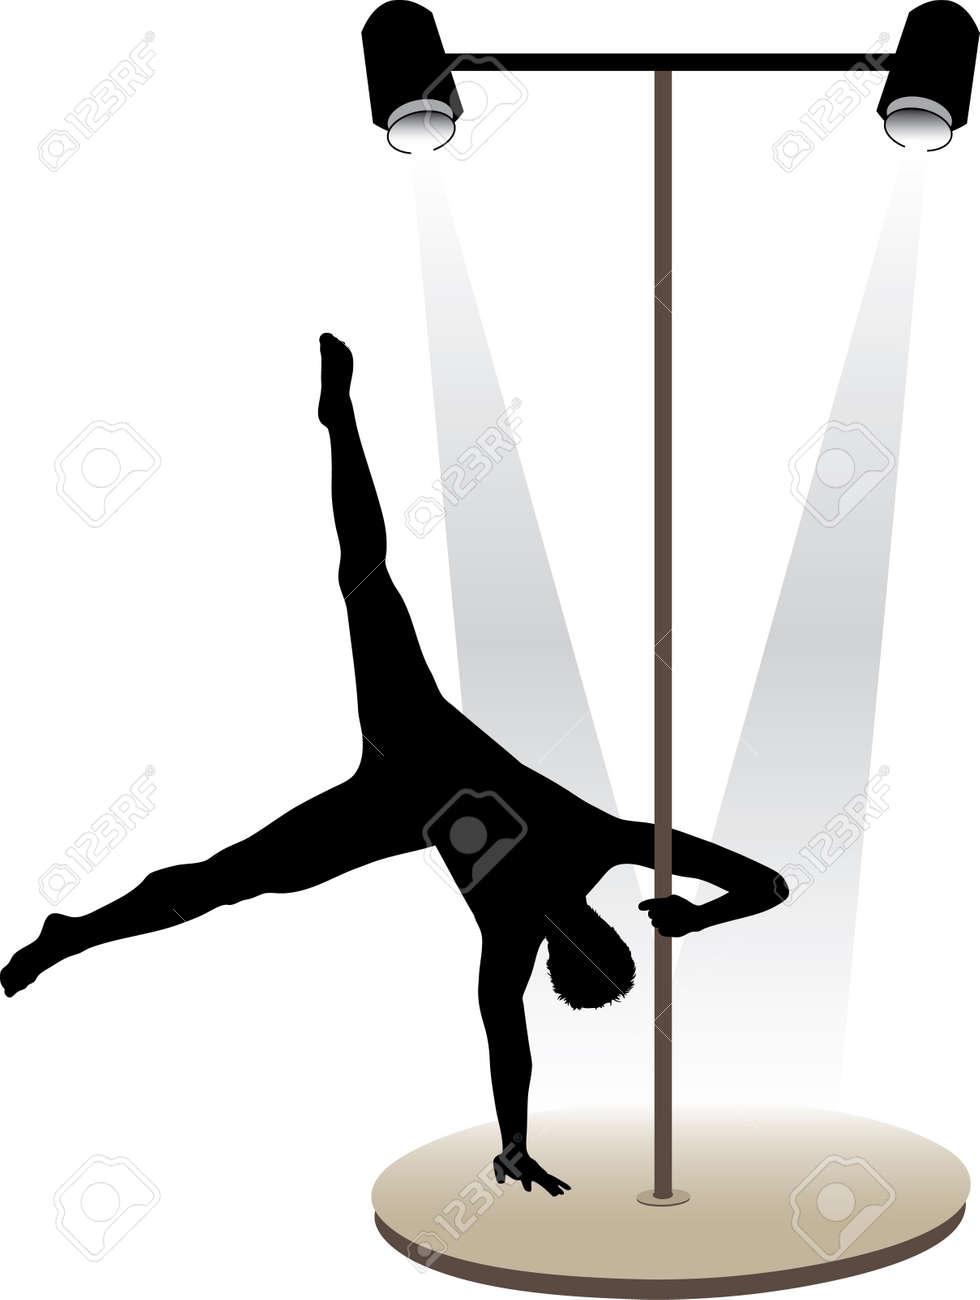 Night club striptease dancers vector illustration Stock Vector - 4271502